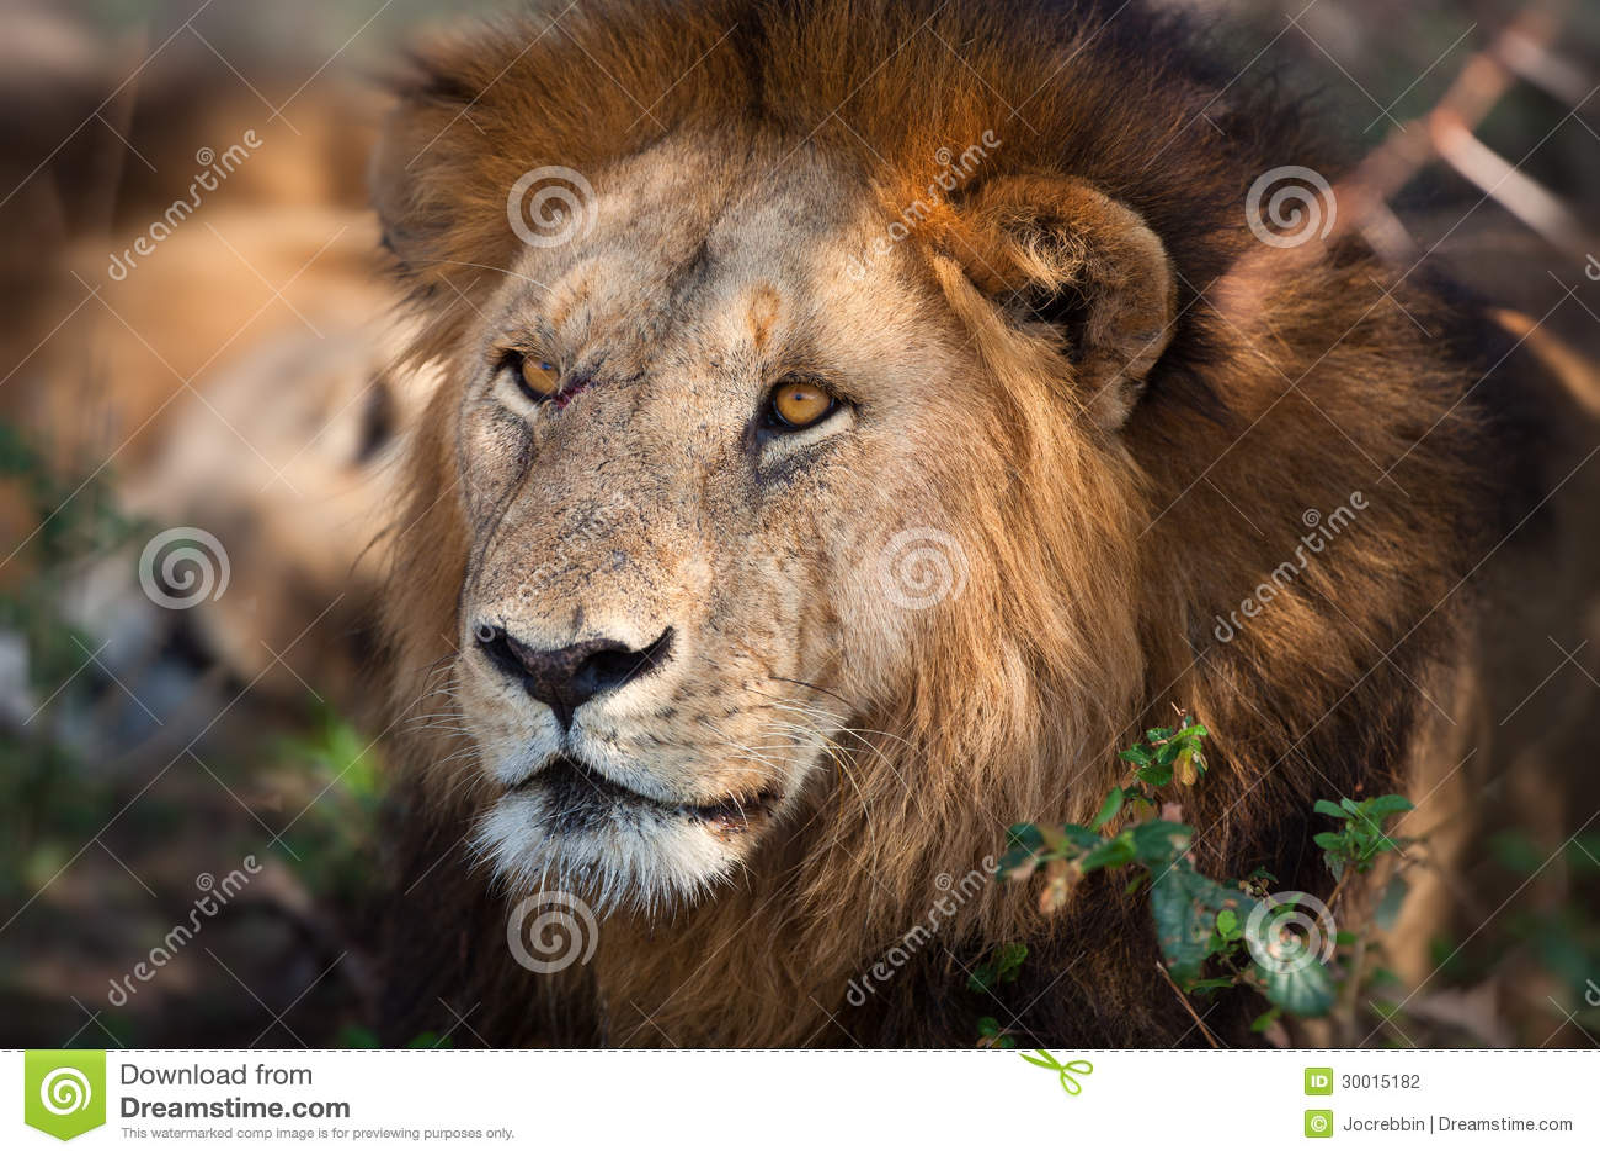 Lion sitting profile - photo#29